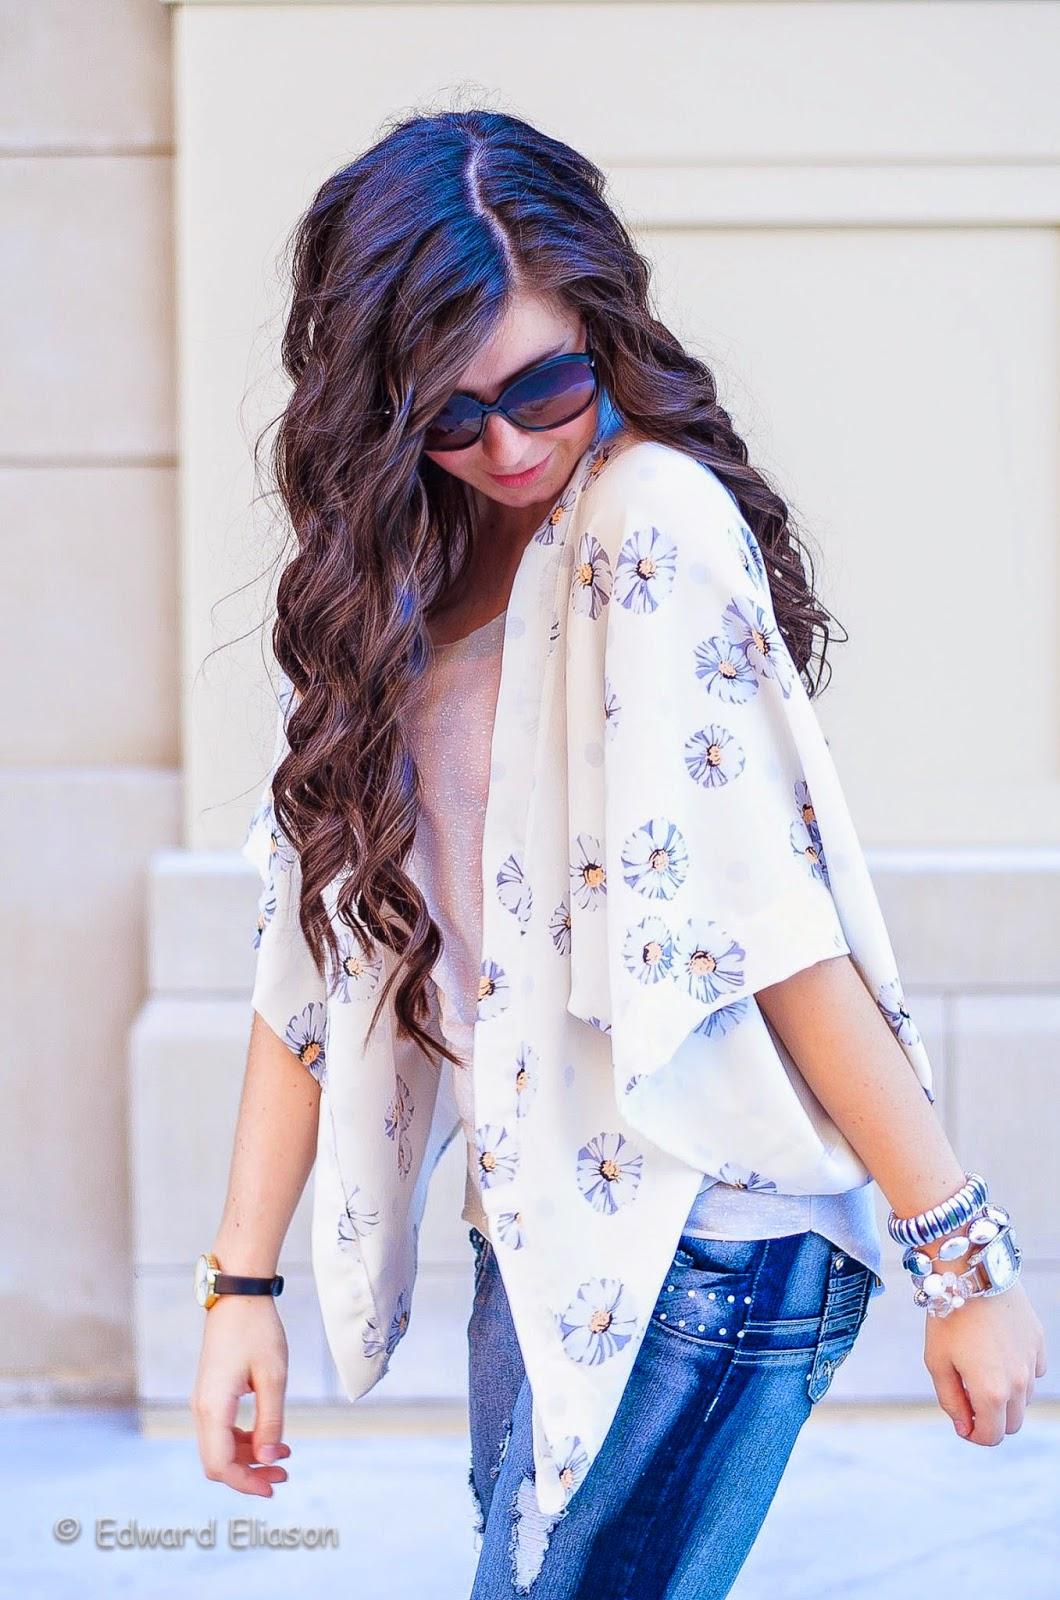 ami clubwear, daisy kimono, destroyed denim, floral kimono, jeans, kimono, kimono outfit, kimono top, the girl that loves, vivat virates,